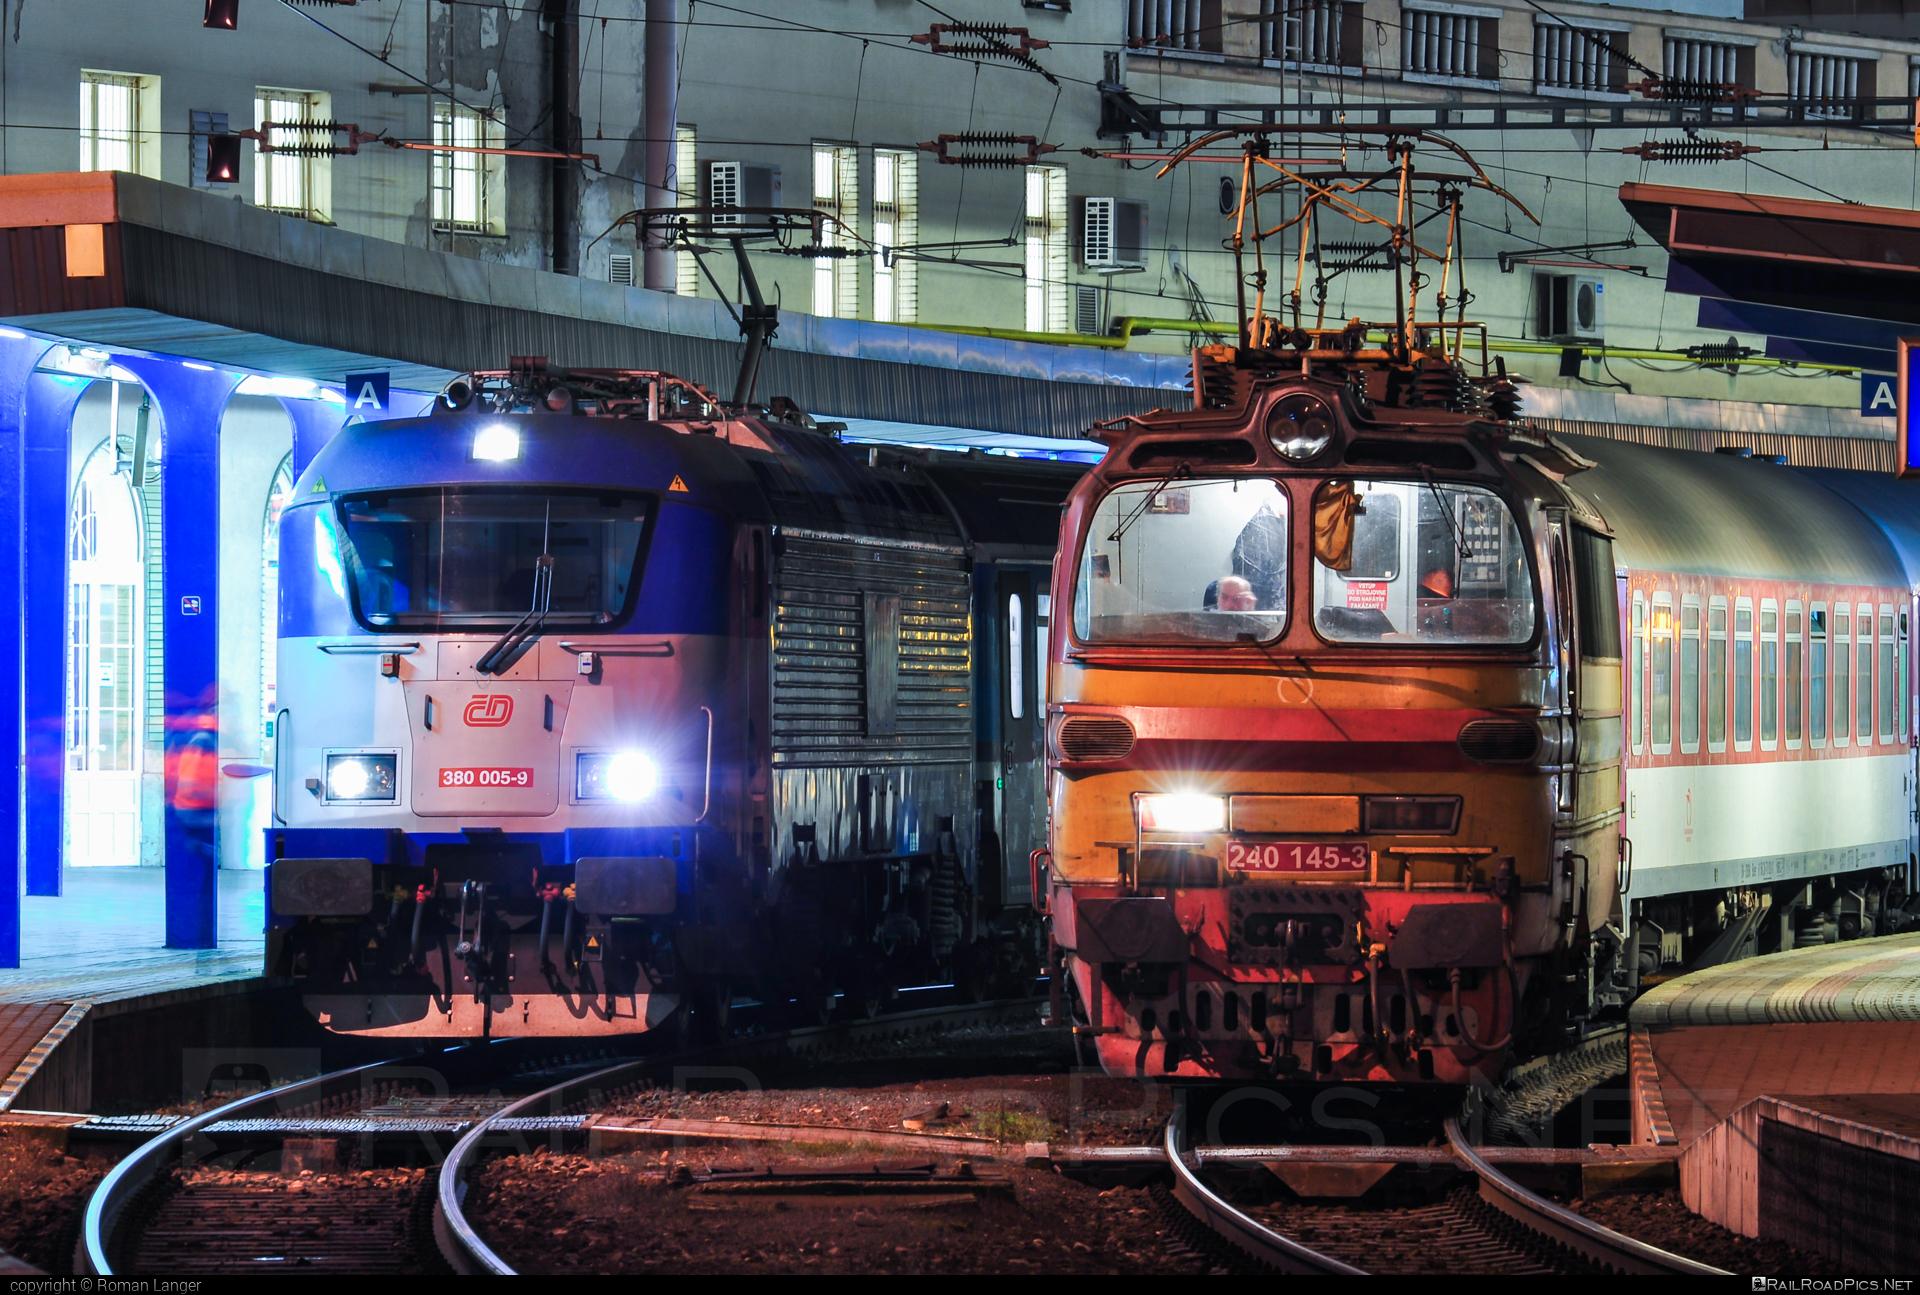 Škoda 47E - 240 145-3 operated by Železničná Spoločnost' Slovensko, a.s. #ZeleznicnaSpolocnostSlovensko #laminatka #locomotive240 #skoda #skoda47e #zssk